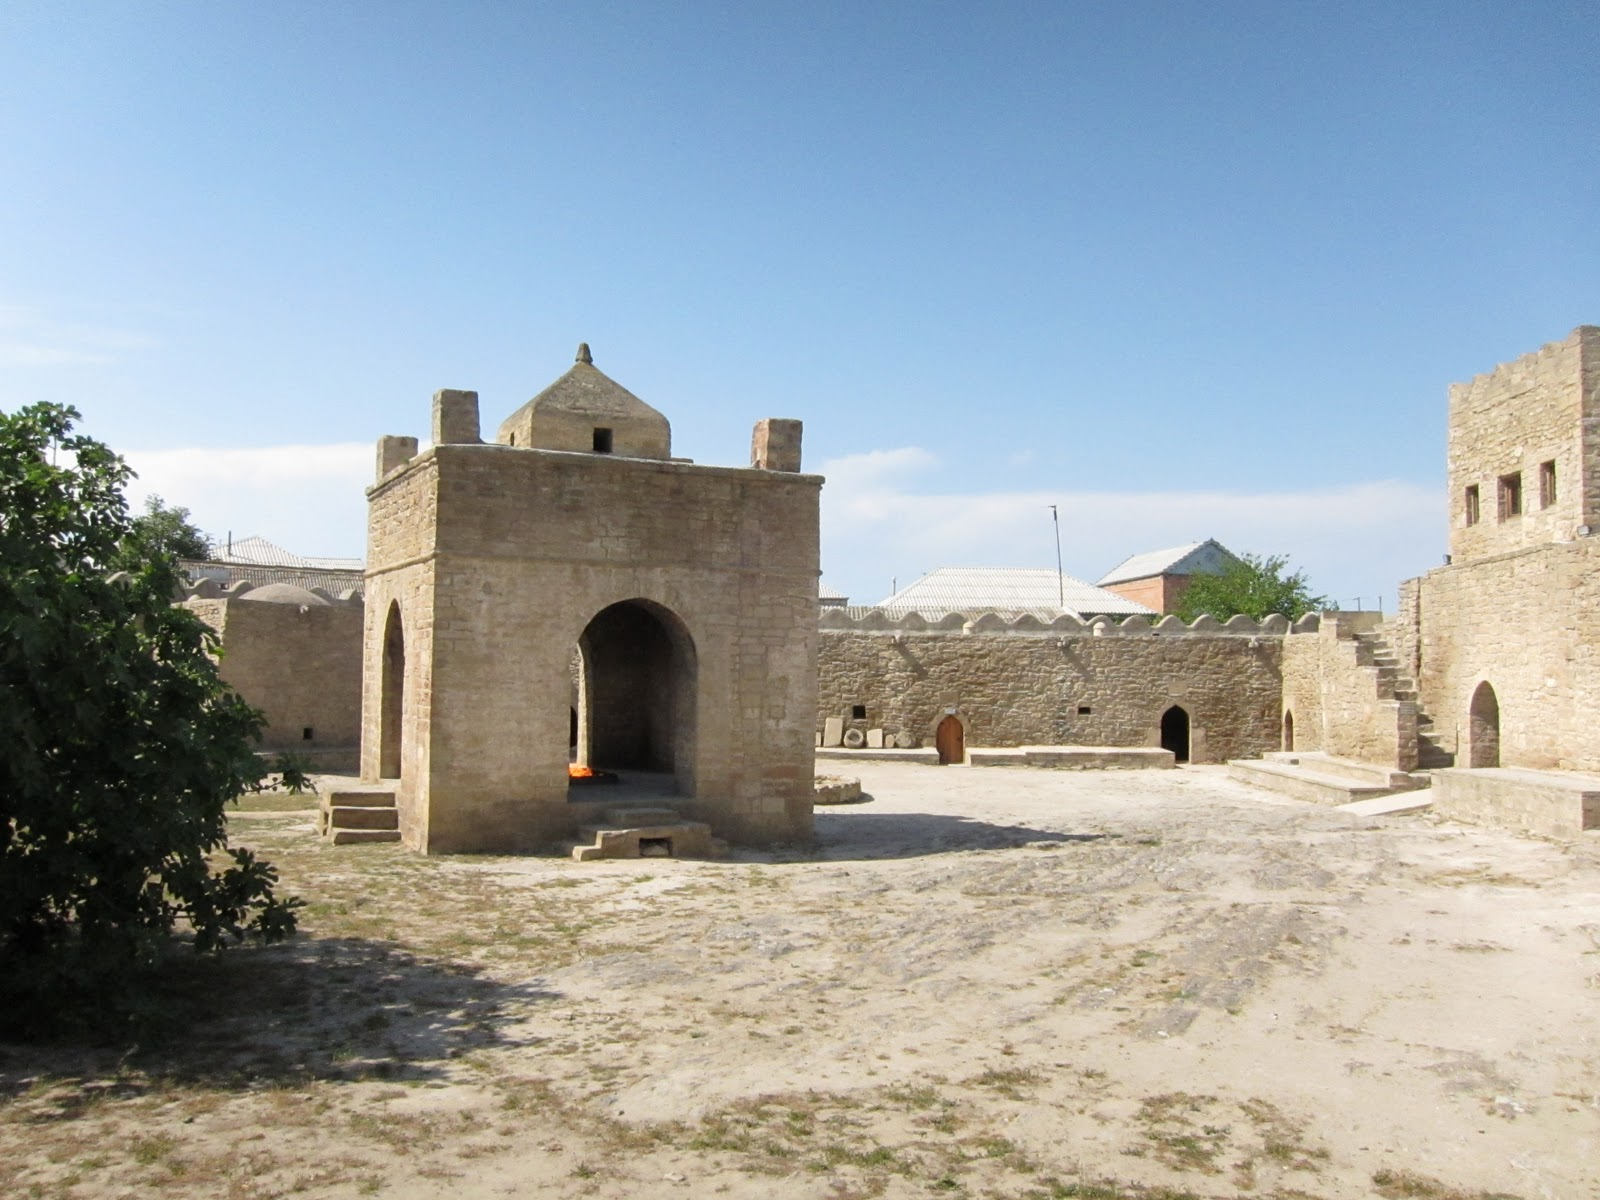 FREE AZERBAIJAN CHAT ROOMS ALTERNATIVE FREECHATROOMS